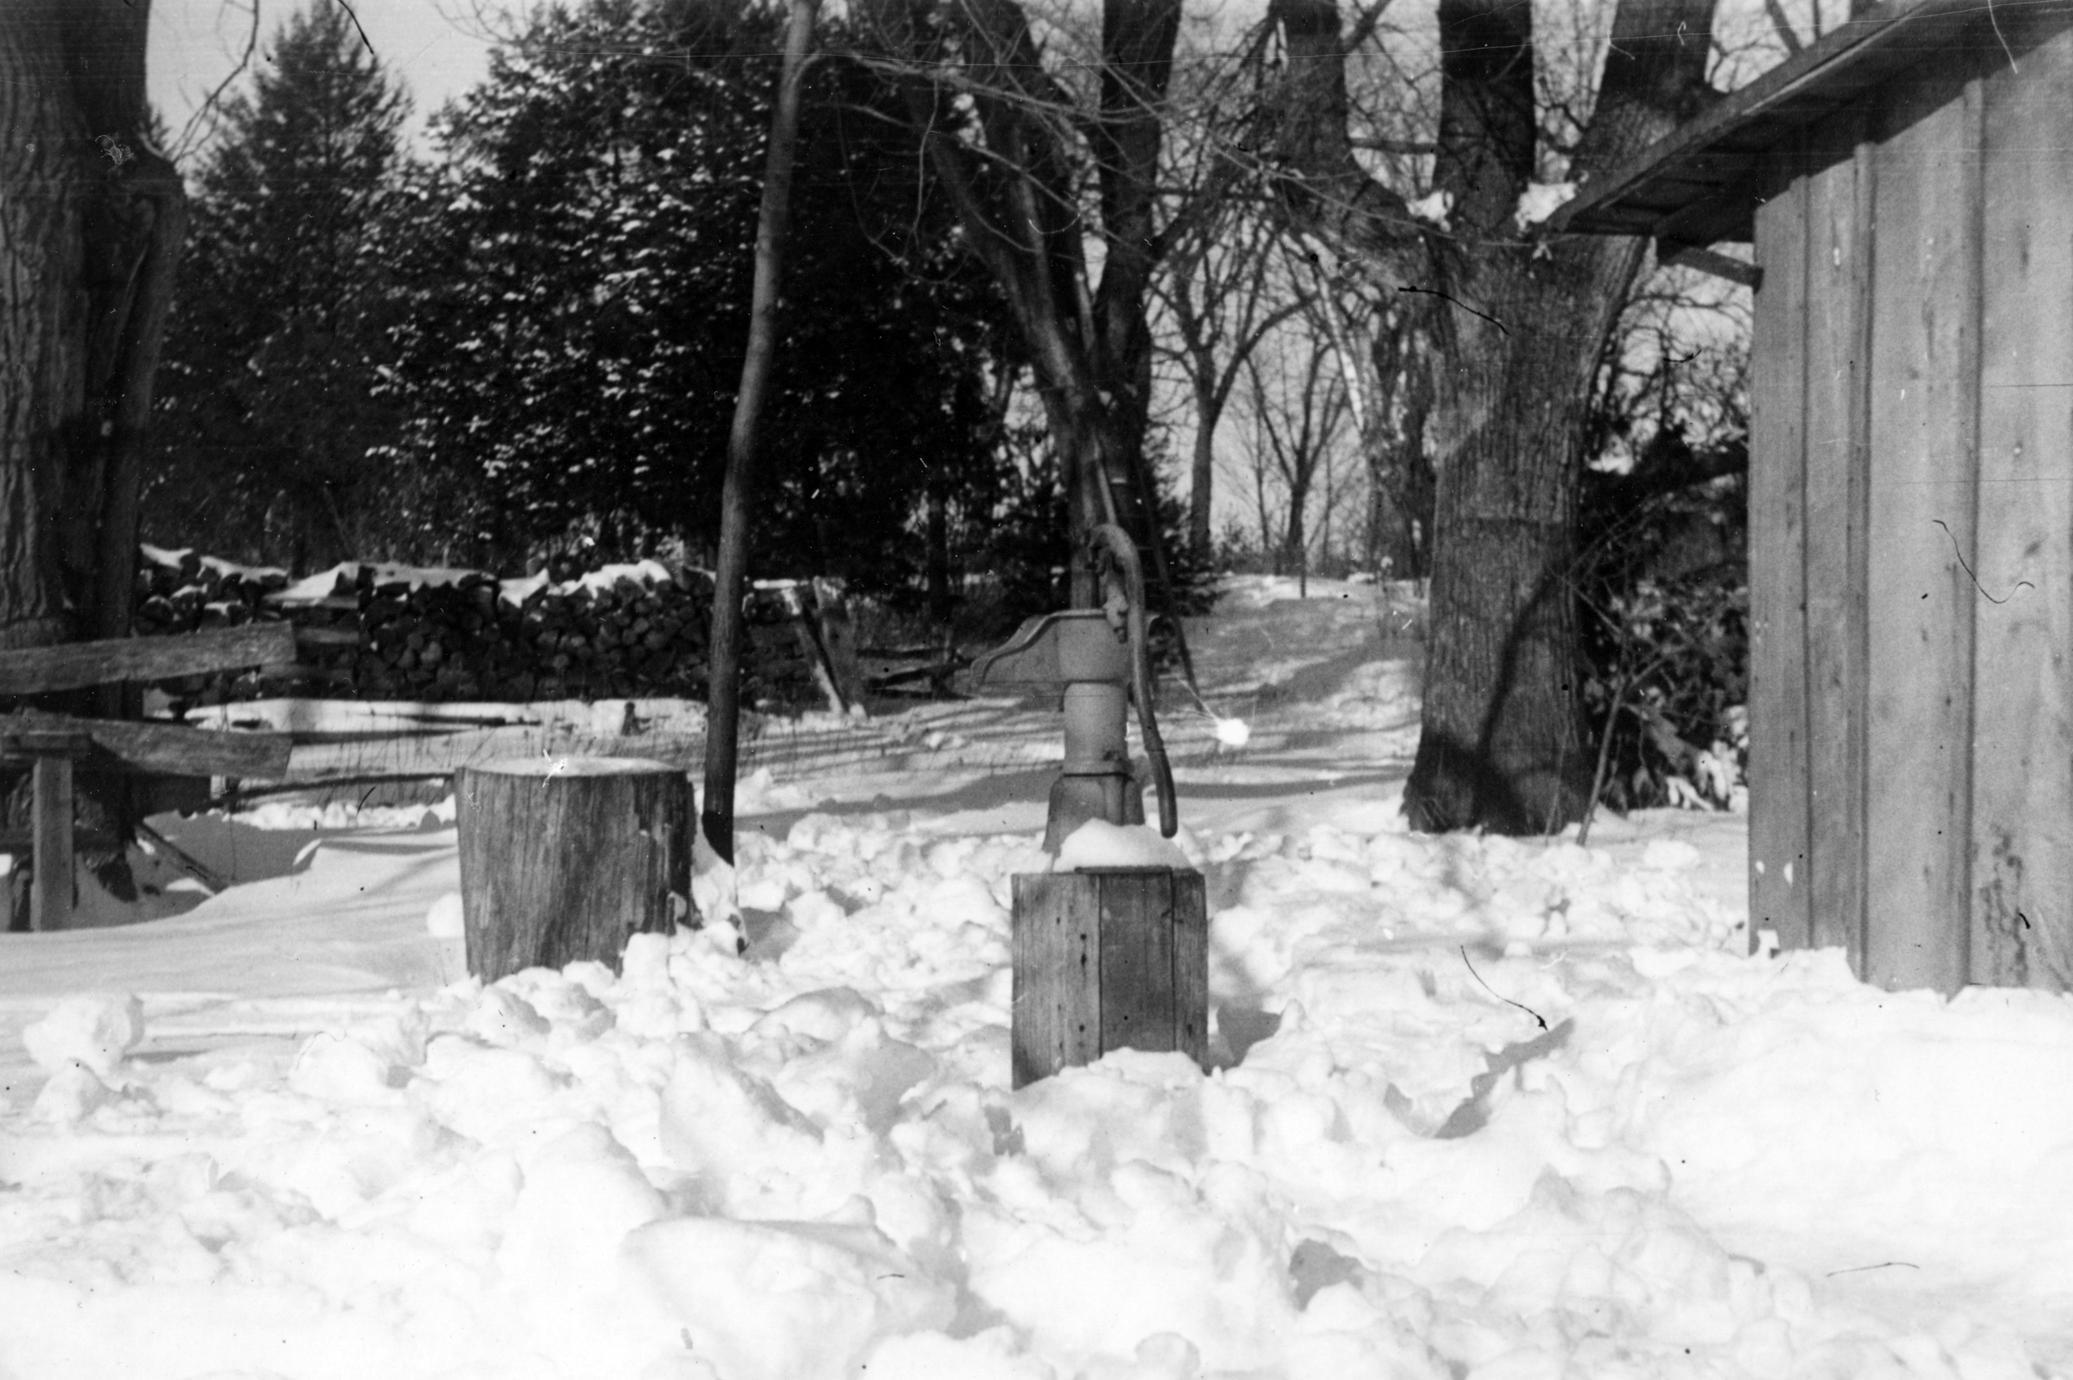 Shack pump in winter